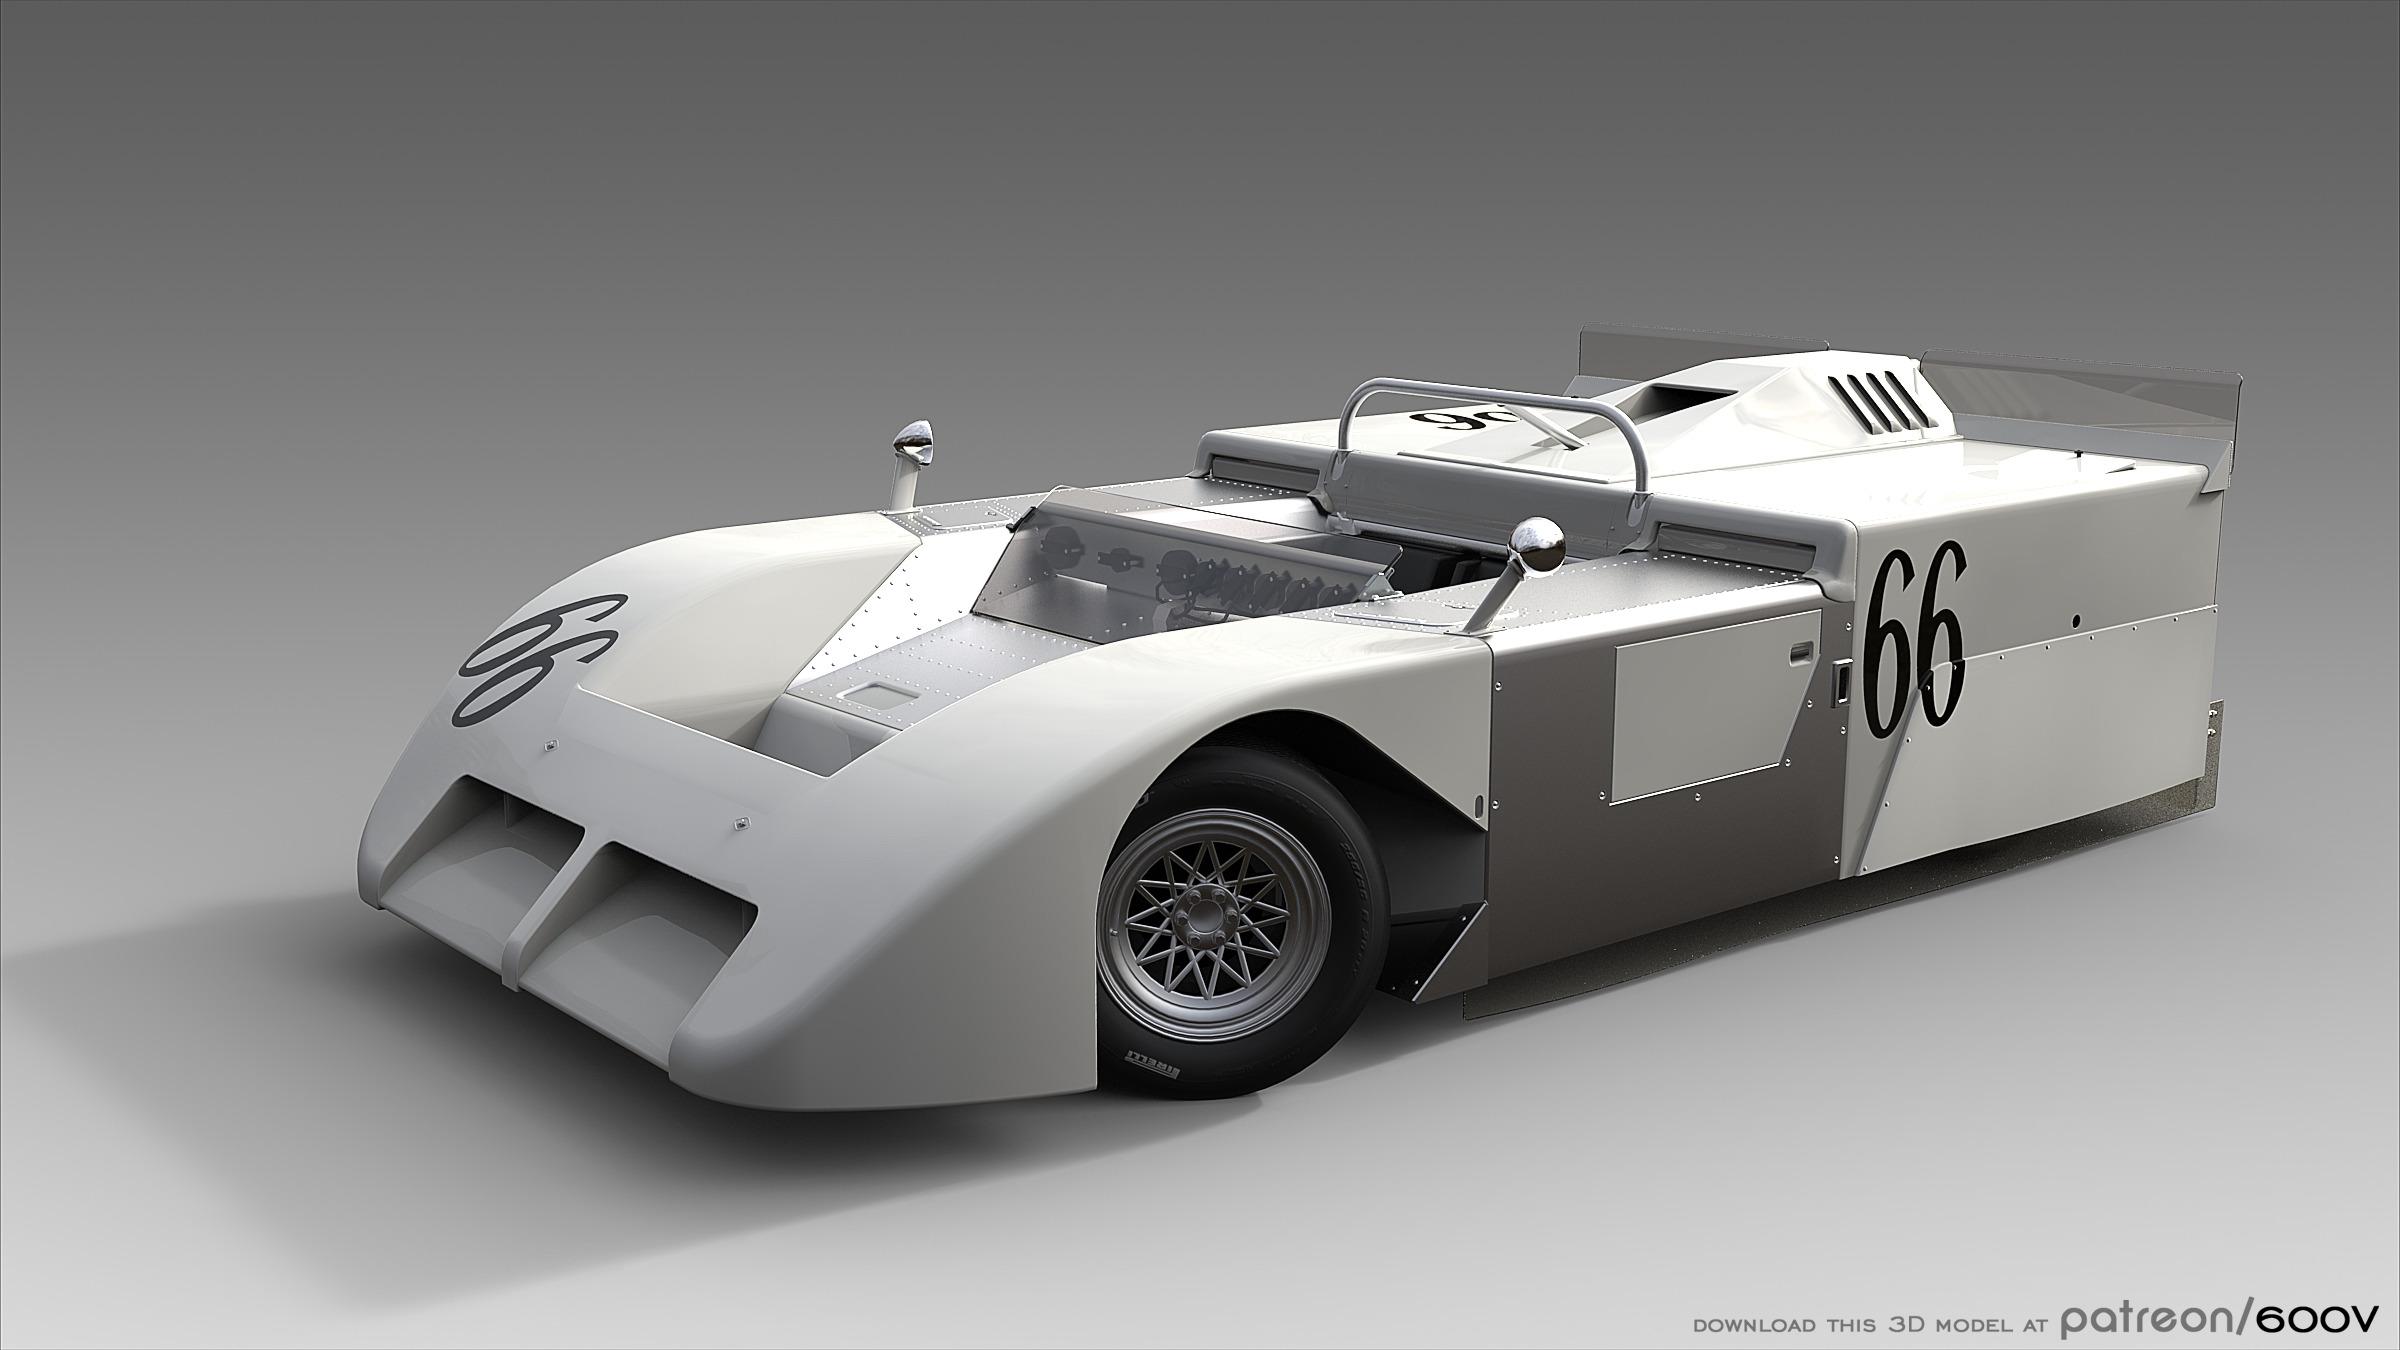 Wallpaper : 2400x1350 px, 2J, 600v, Chaparral, old car, race cars ...